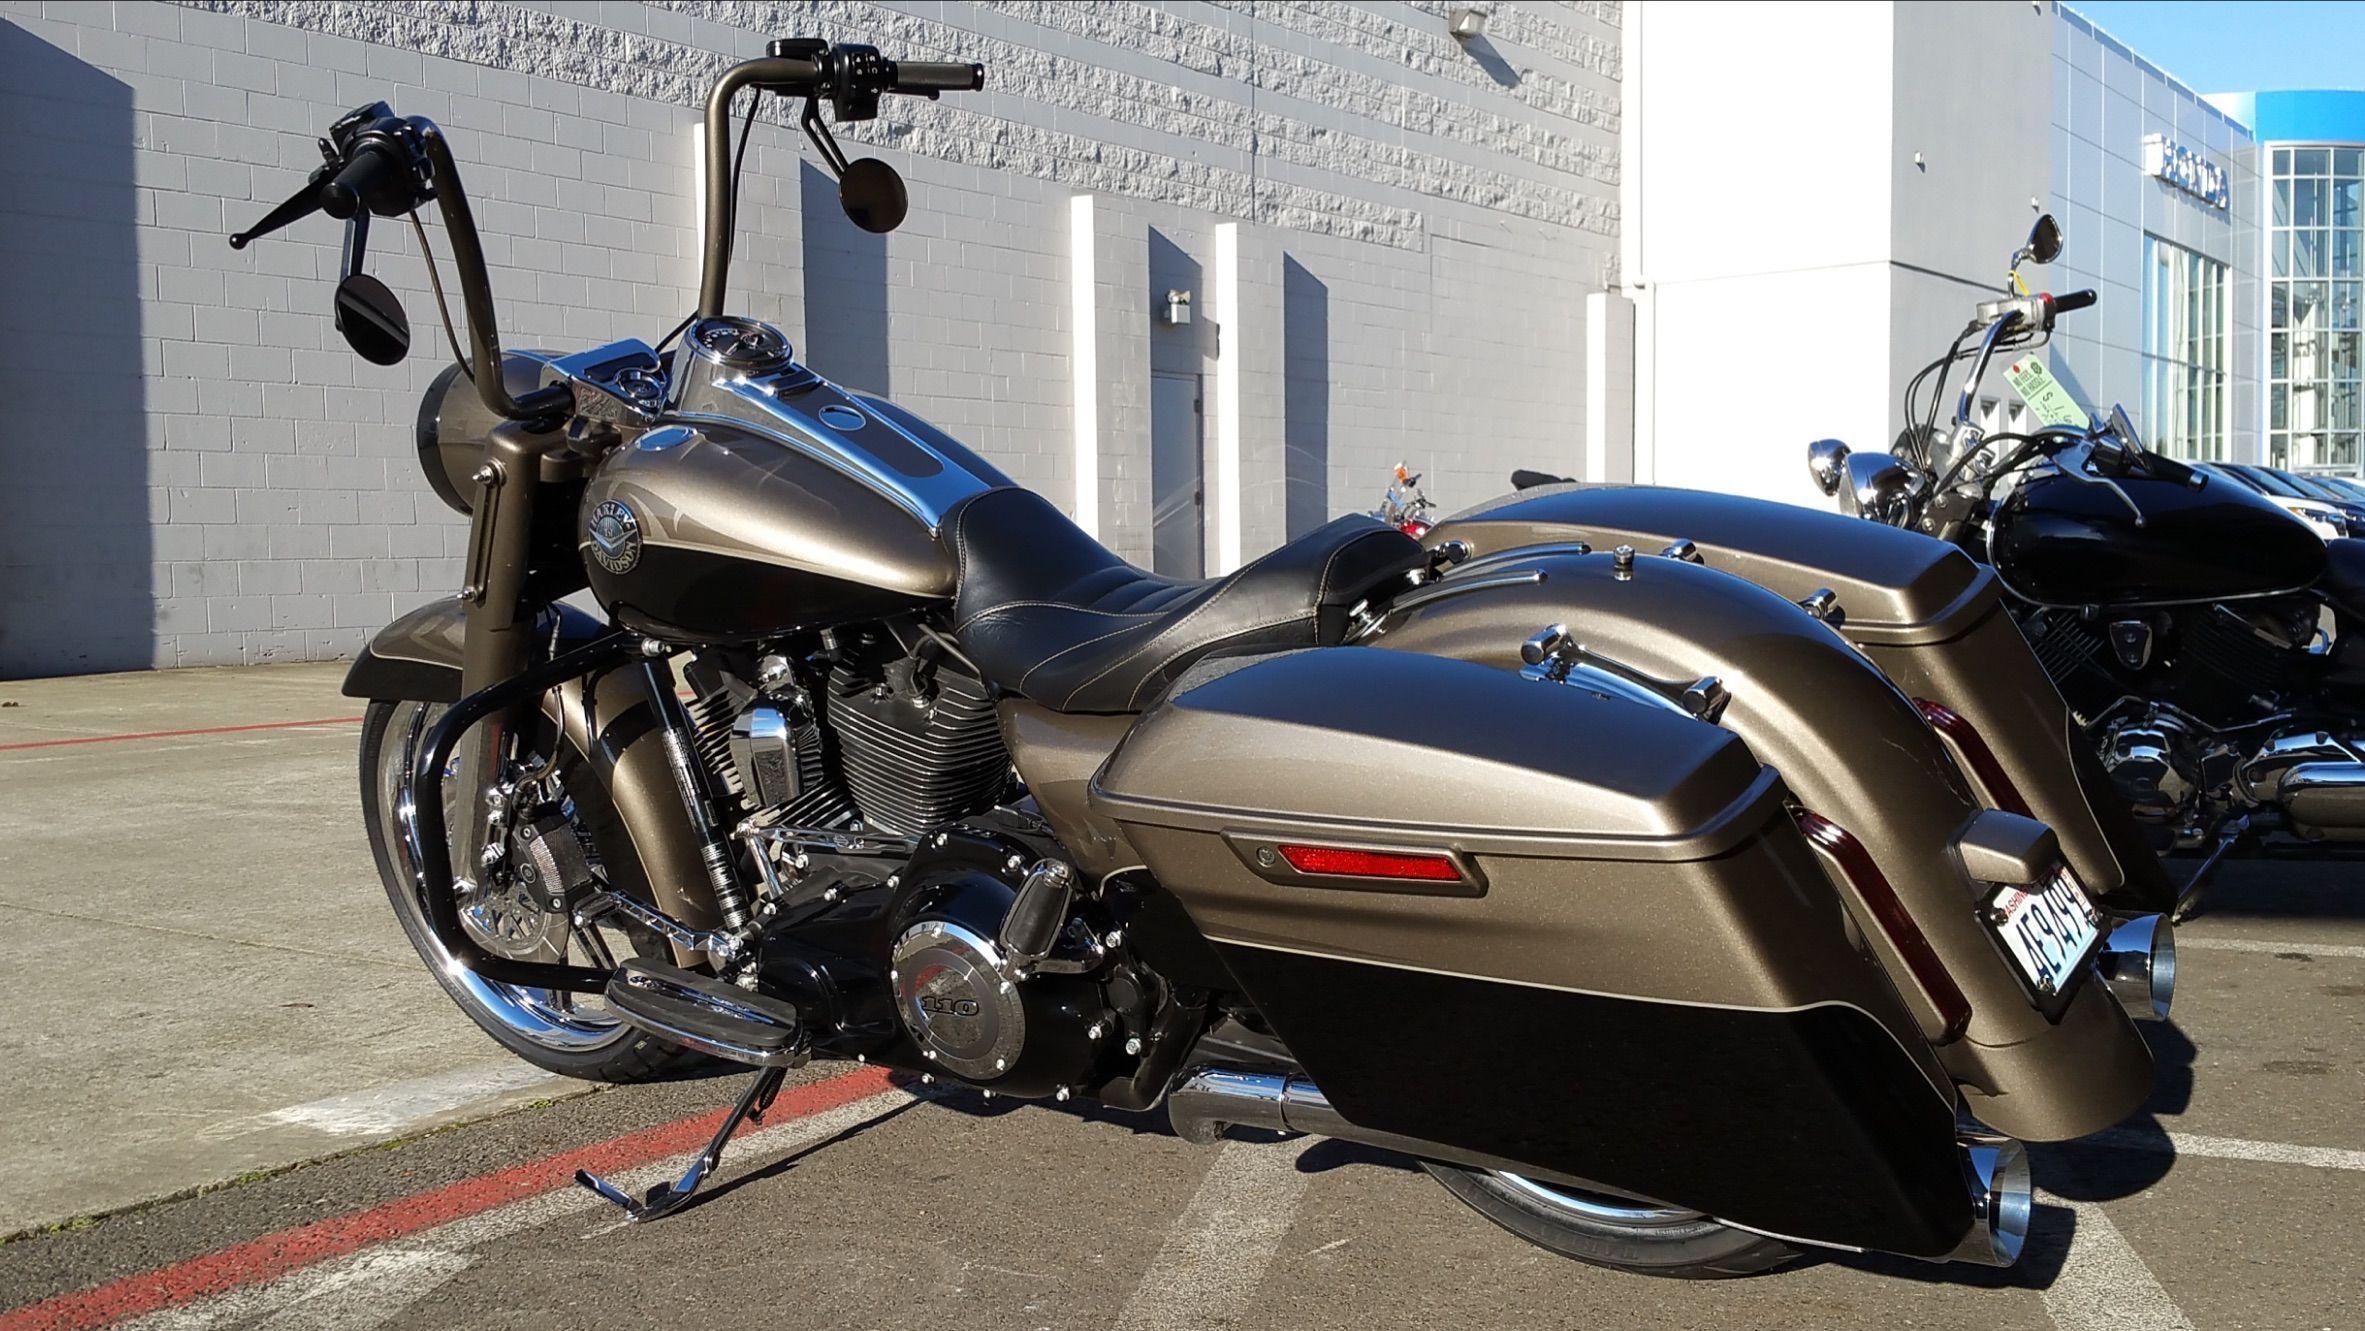 2014 Cvo Road King Harleydavidsonroadkingcvo Harleydavidsoncustommotorcyclesroadking Harley Davidson Baggers Harley Davidson Harley Bikes